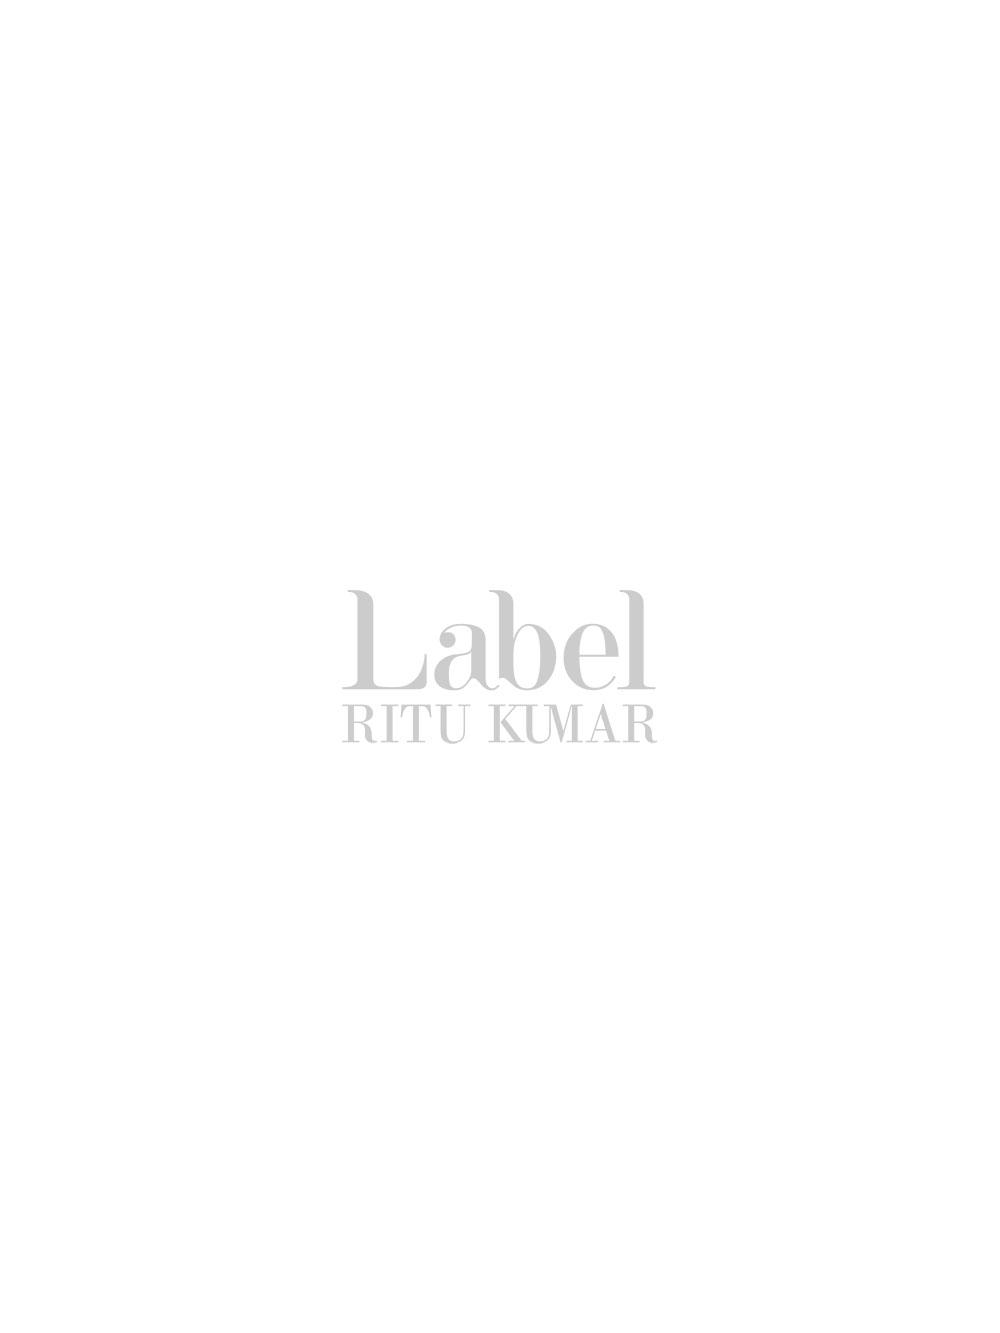 Grey Embellished Jumpsuit by label ritu kumar